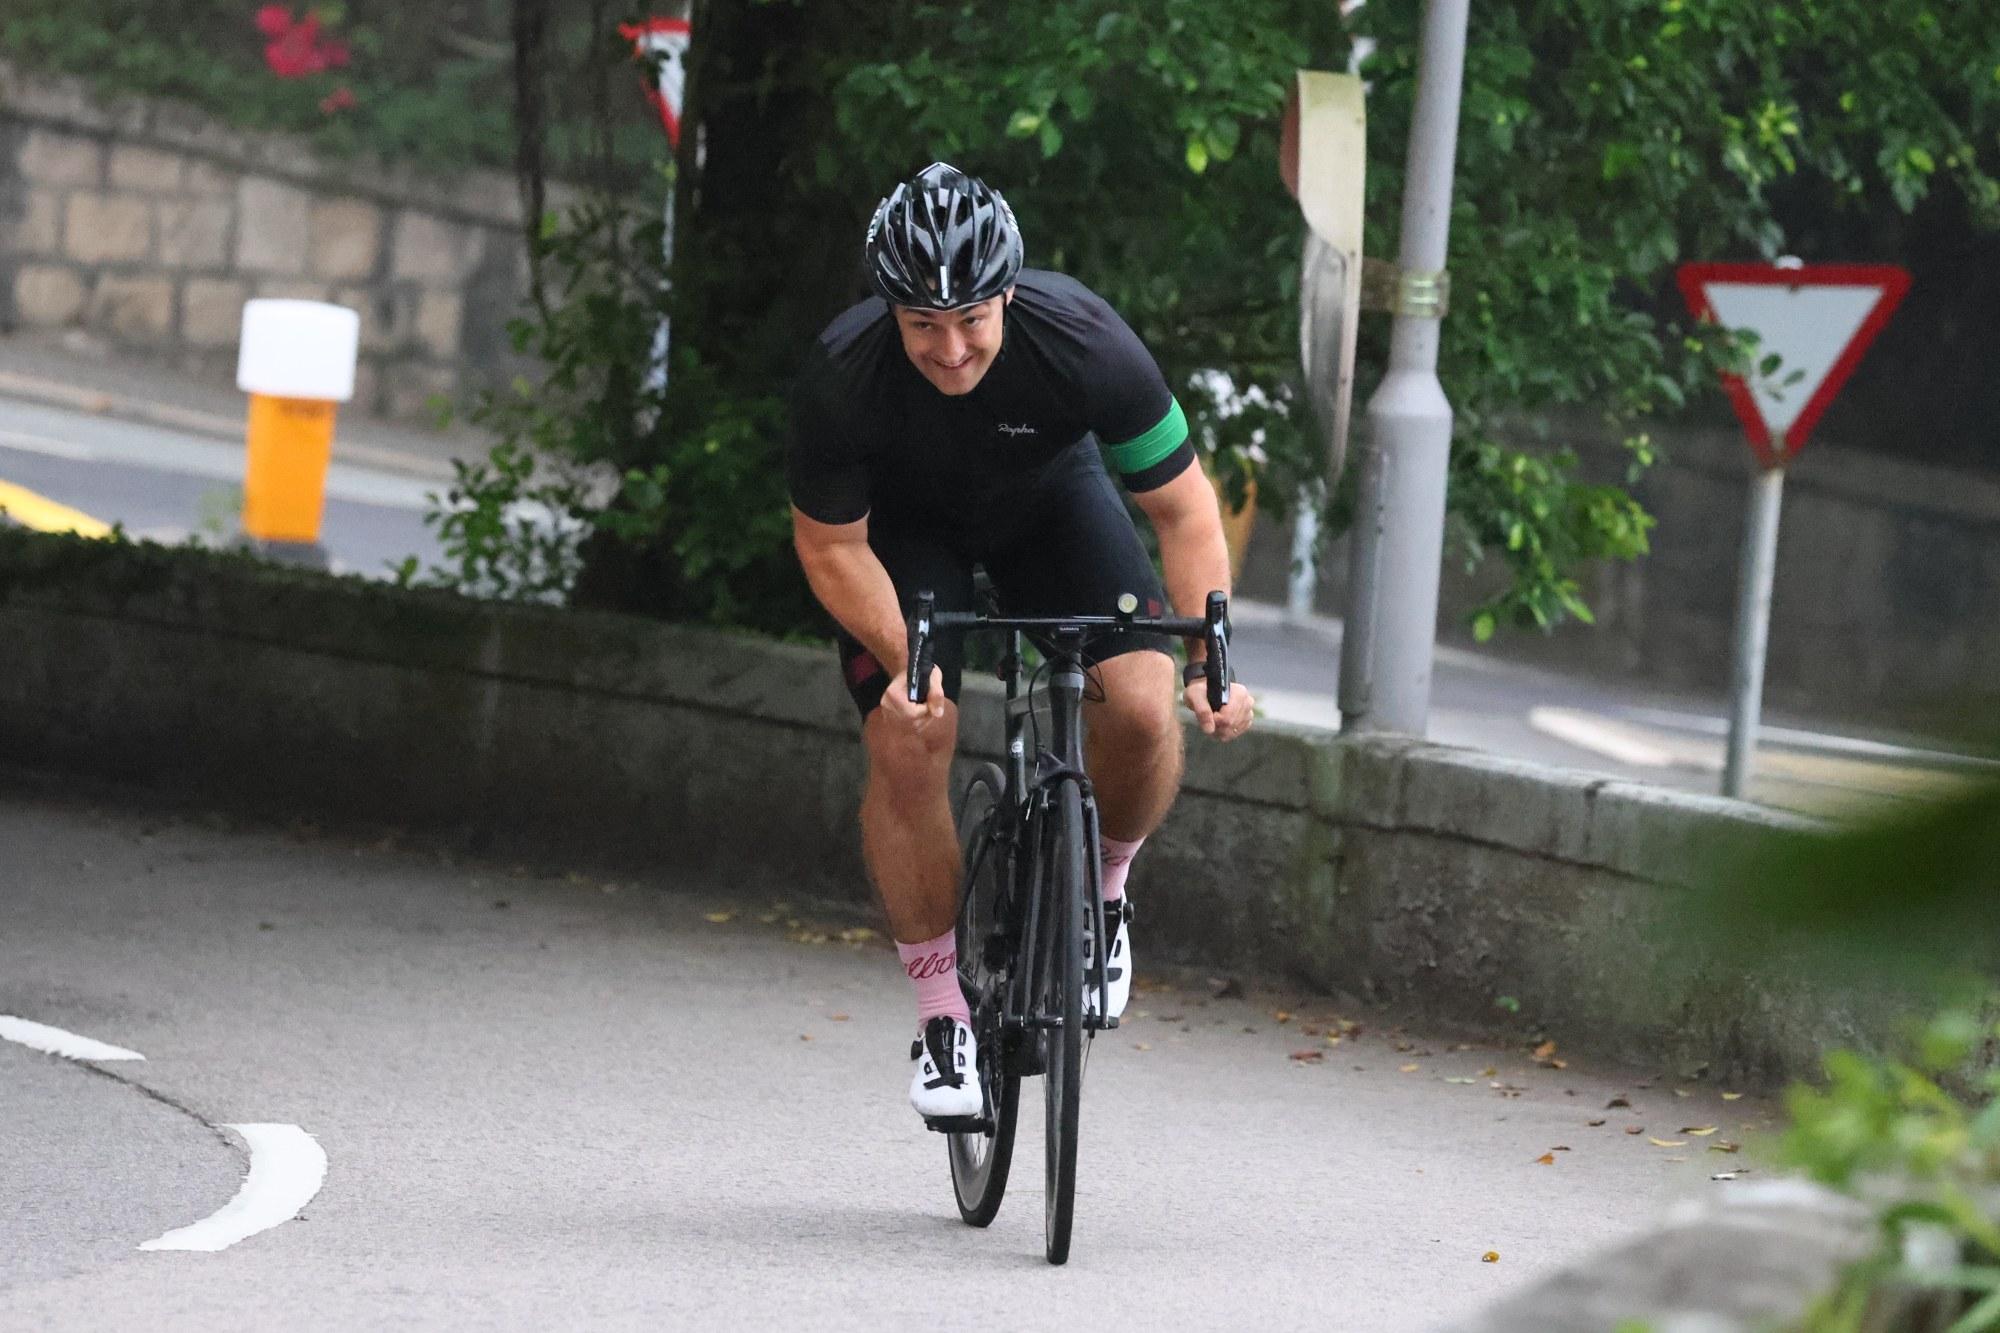 John McCormick-Houston riding his bike to raise money for the programme. Photo: Dickson Lee